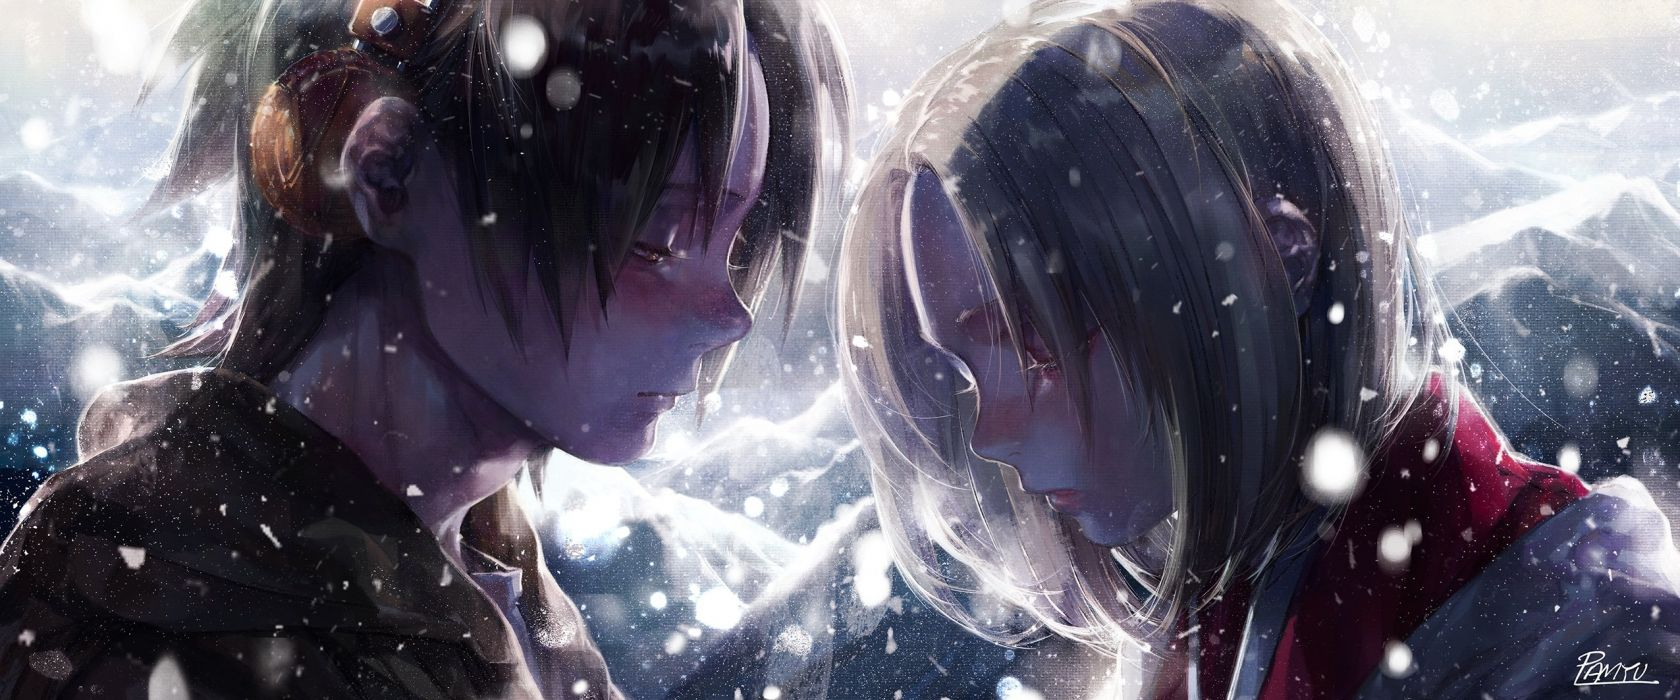 dualscreen headphones hei hwan kyoyama anna male shaman king short hair signed snow yoh asakura wallpaper